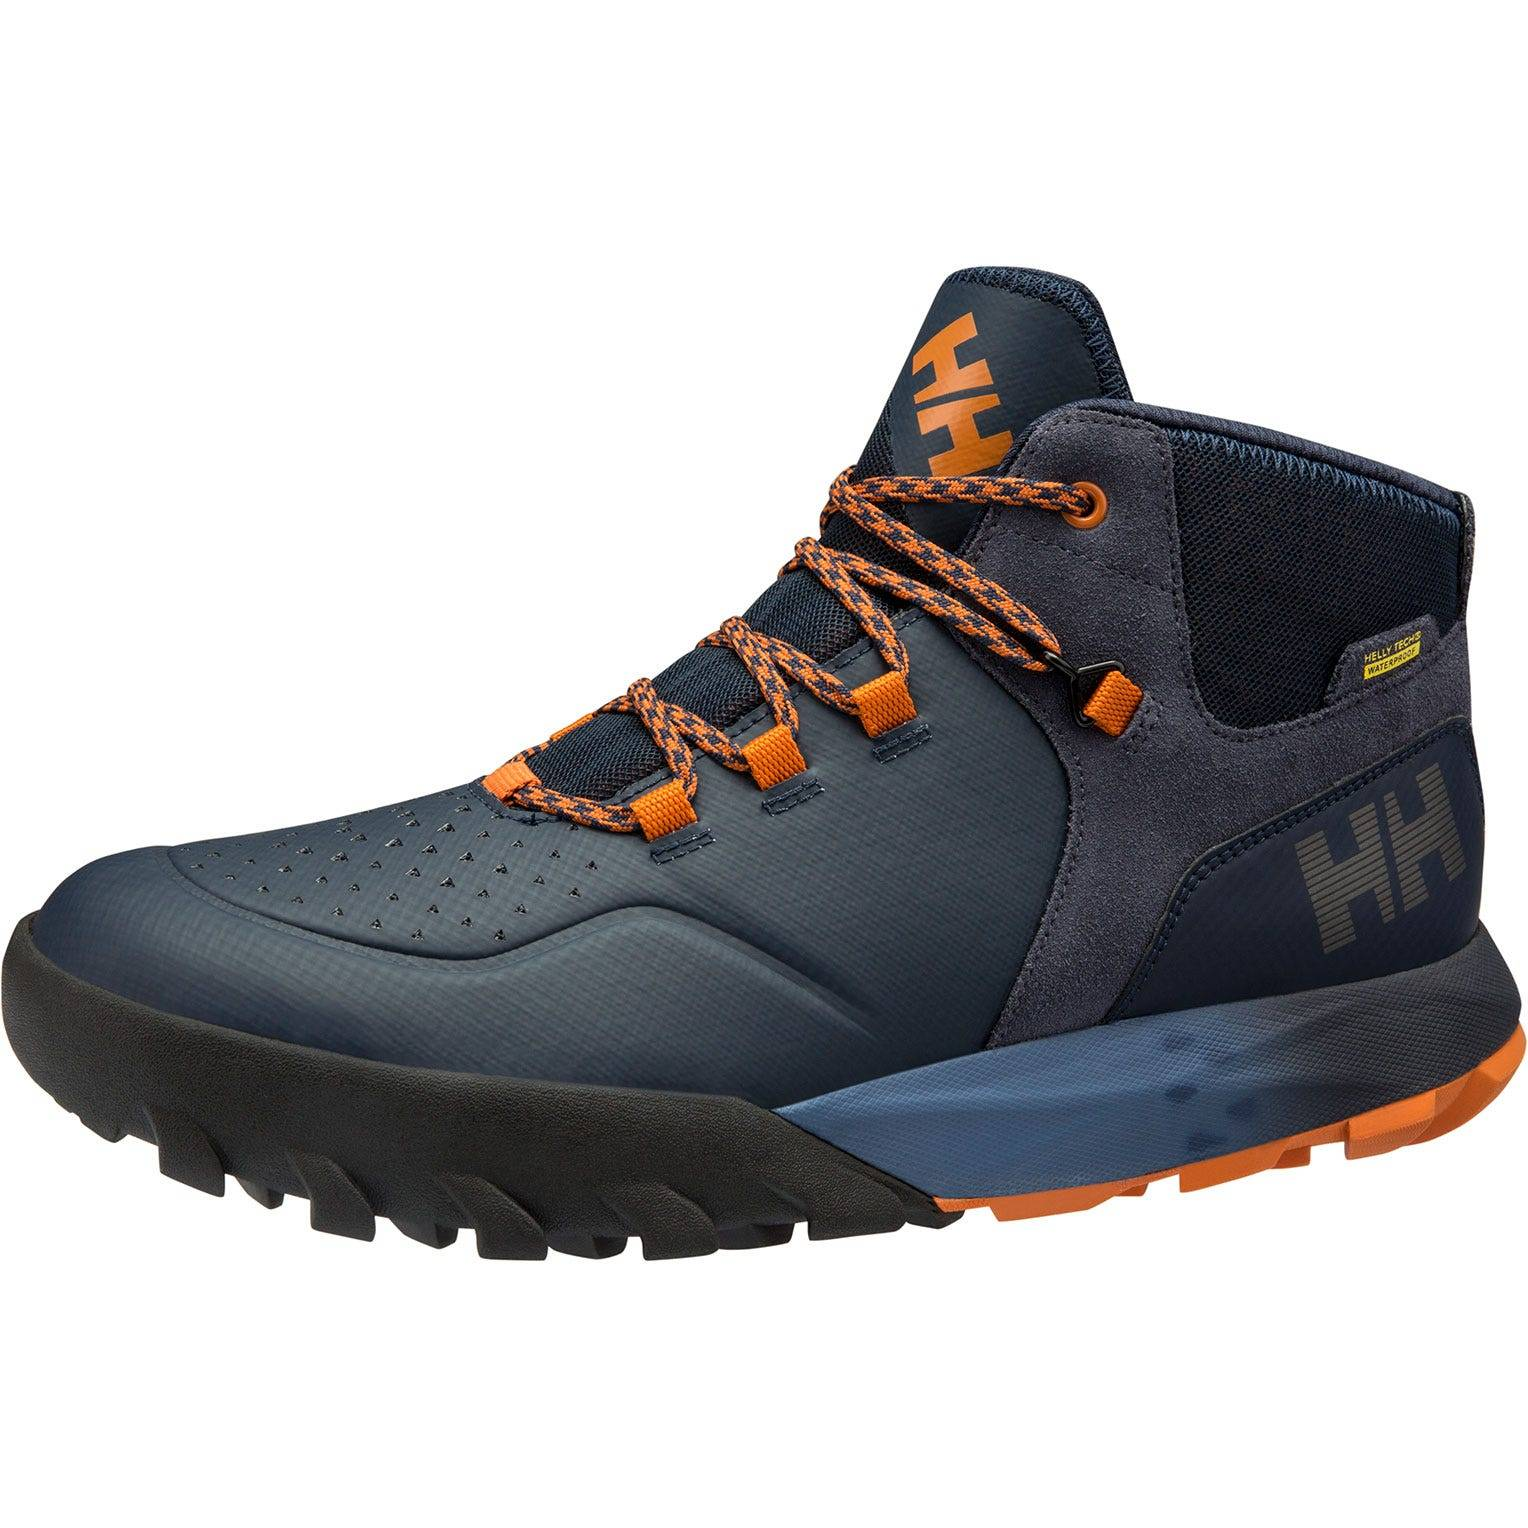 Helly Hansen Loke Rambler Ht Mens Hiking Boot Navy 43/9.5